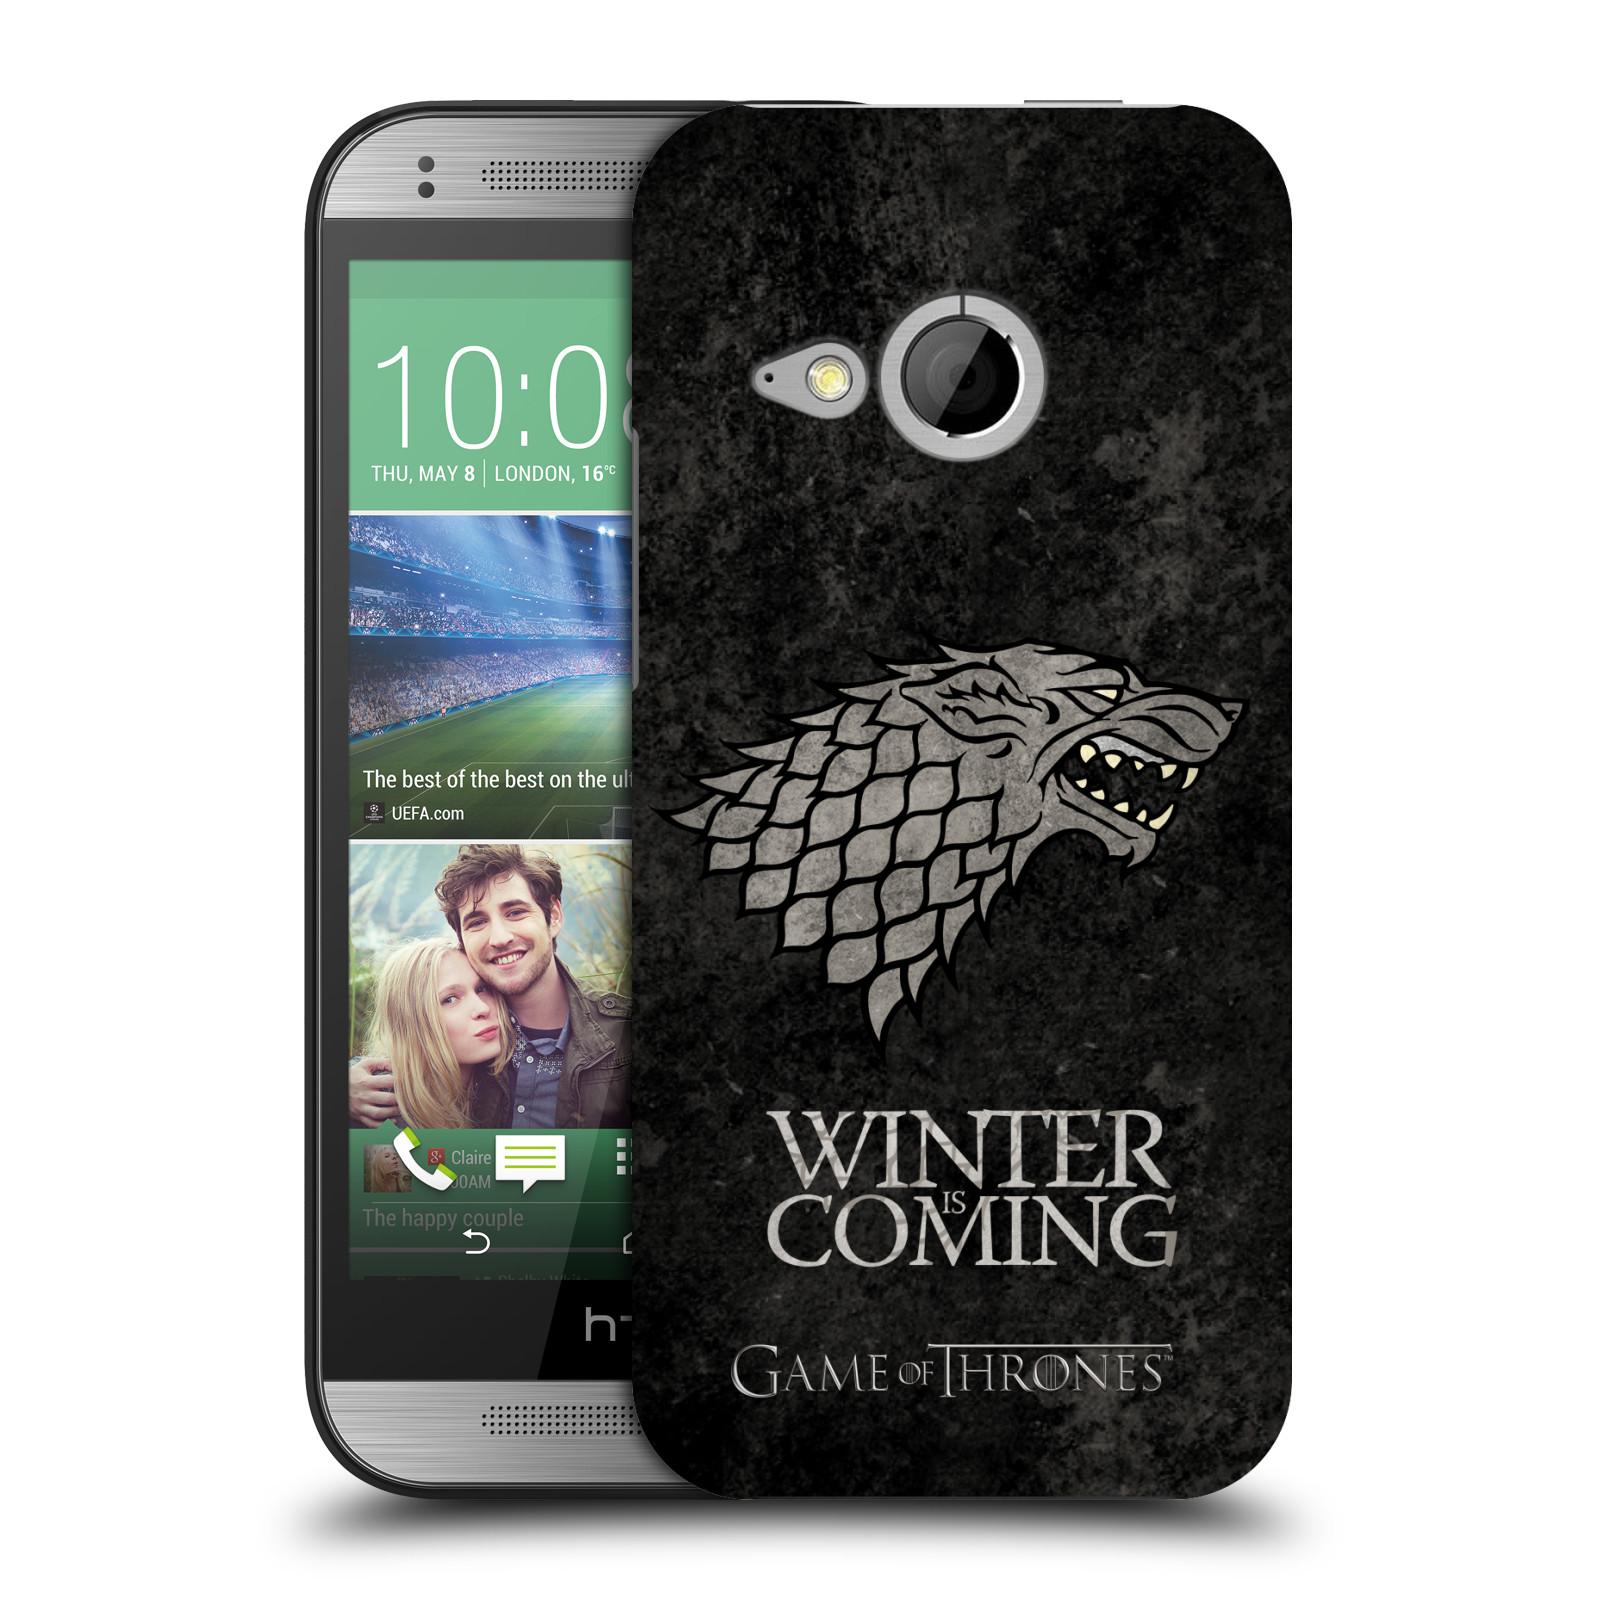 Plastové pouzdro na mobil HTC ONE Mini 2 HEAD CASE Hra o trůny - Stark - Winter is coming